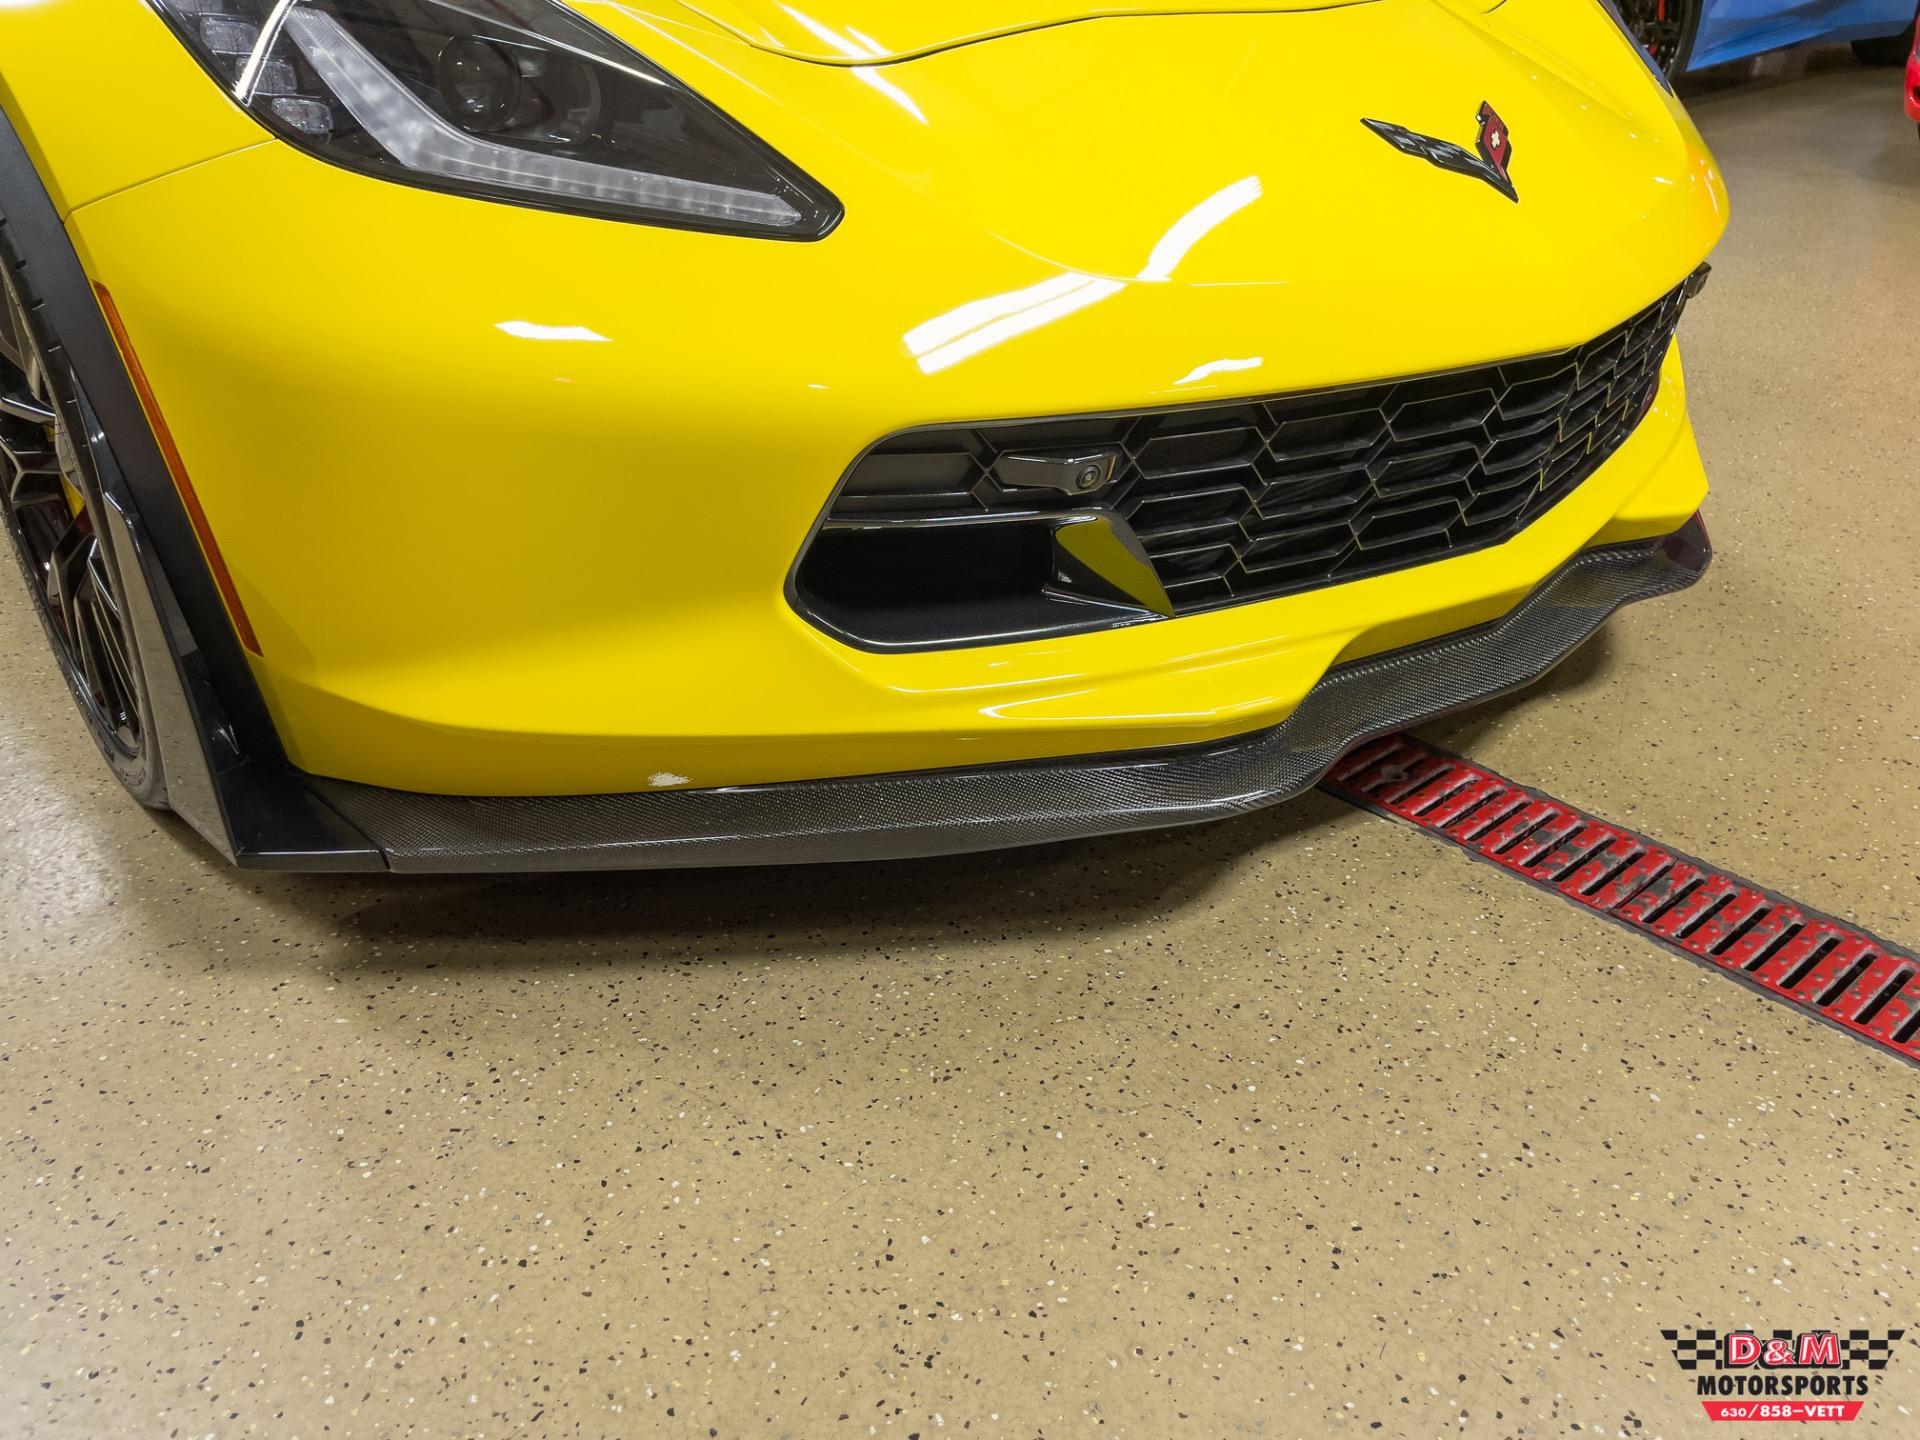 Used 2017 Chevrolet Corvette Z06 Coupe | Glen Ellyn, IL